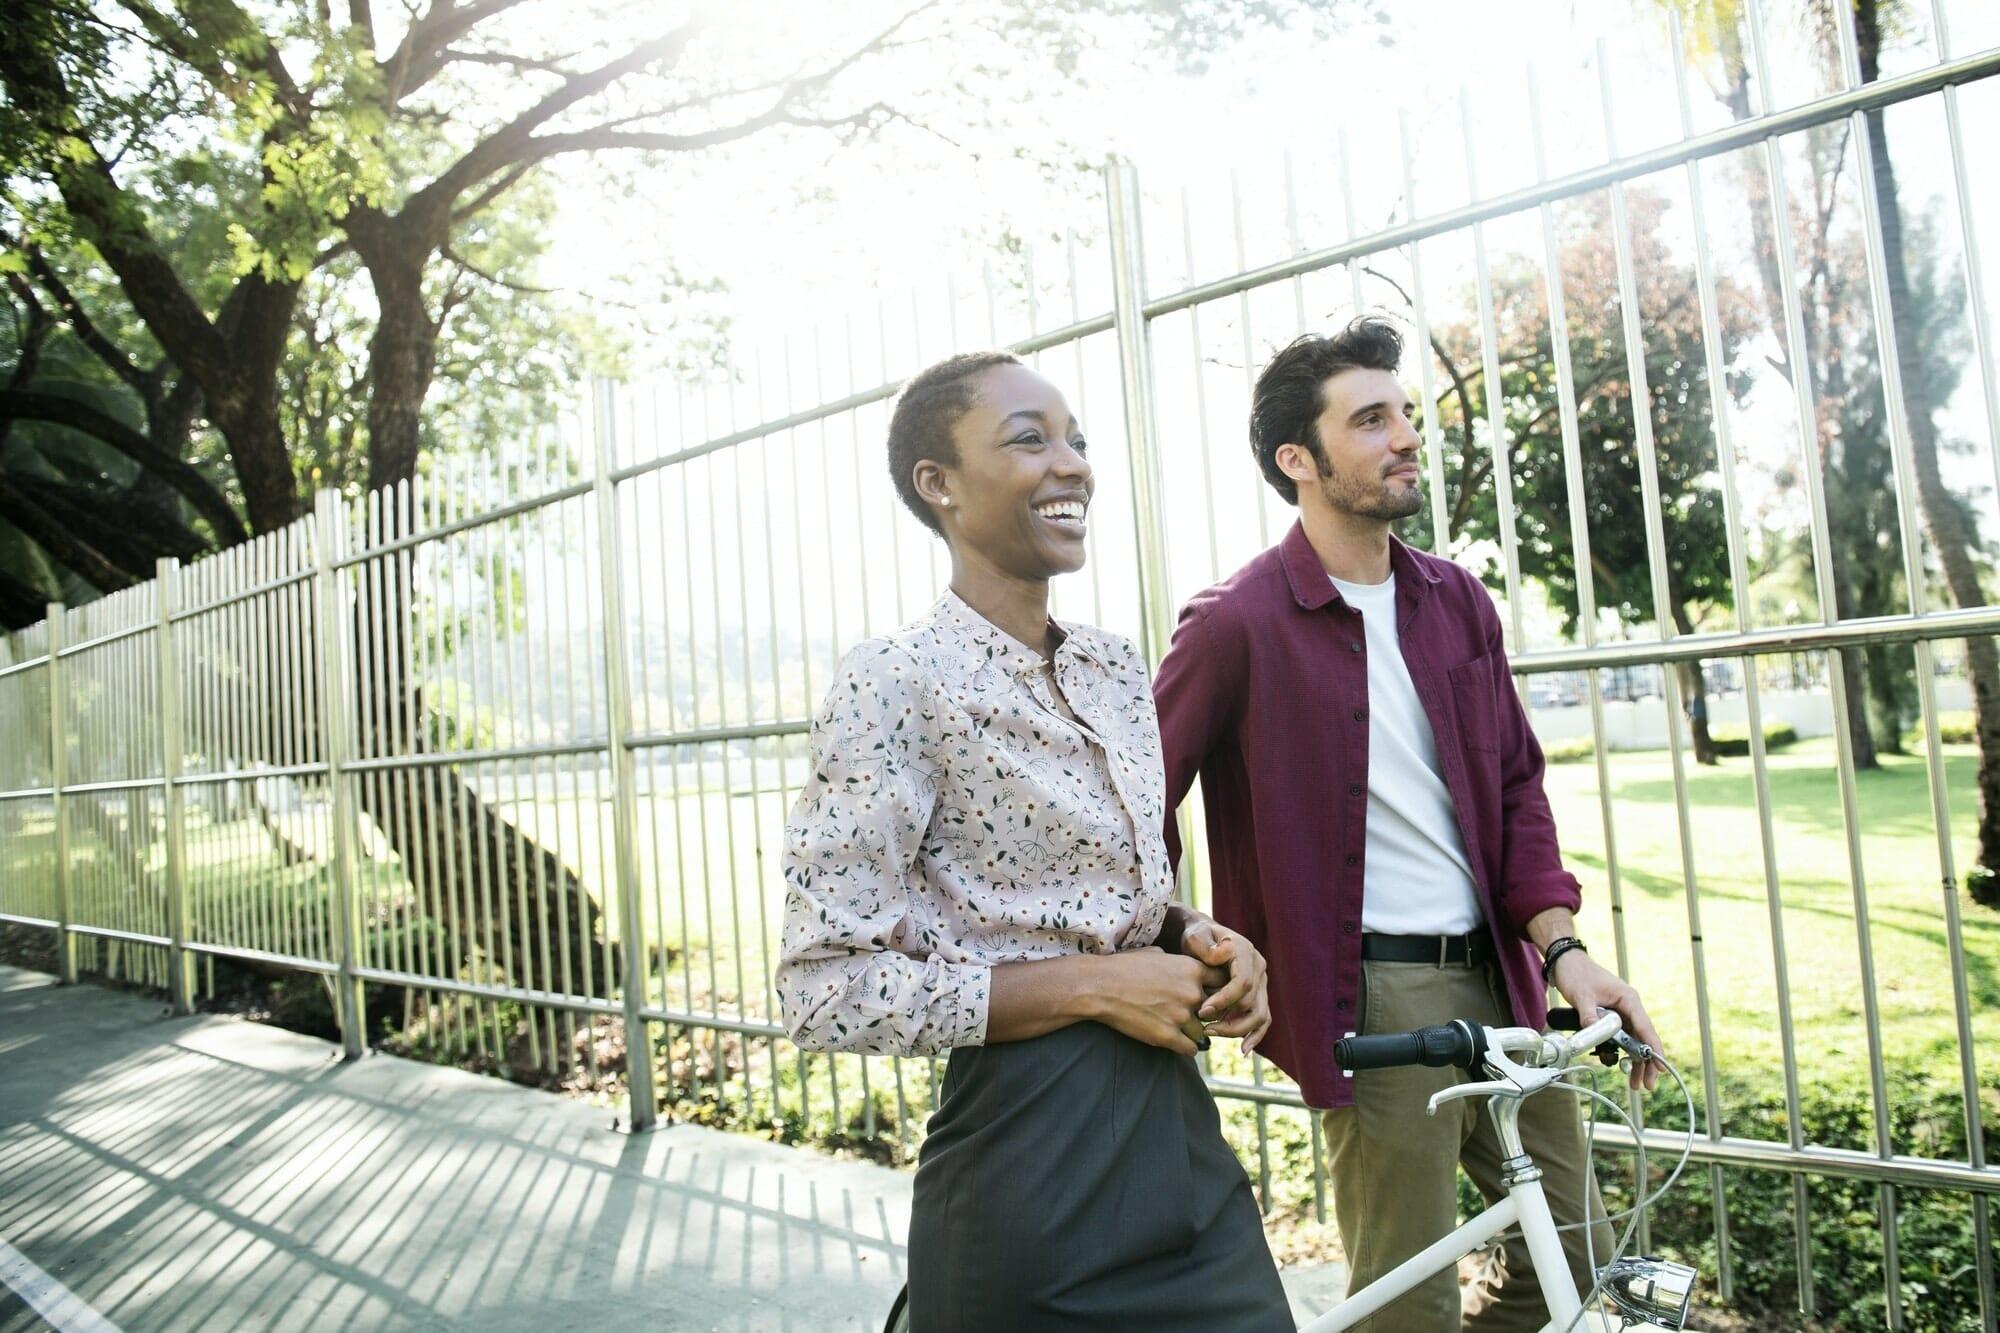 Outdoor dating